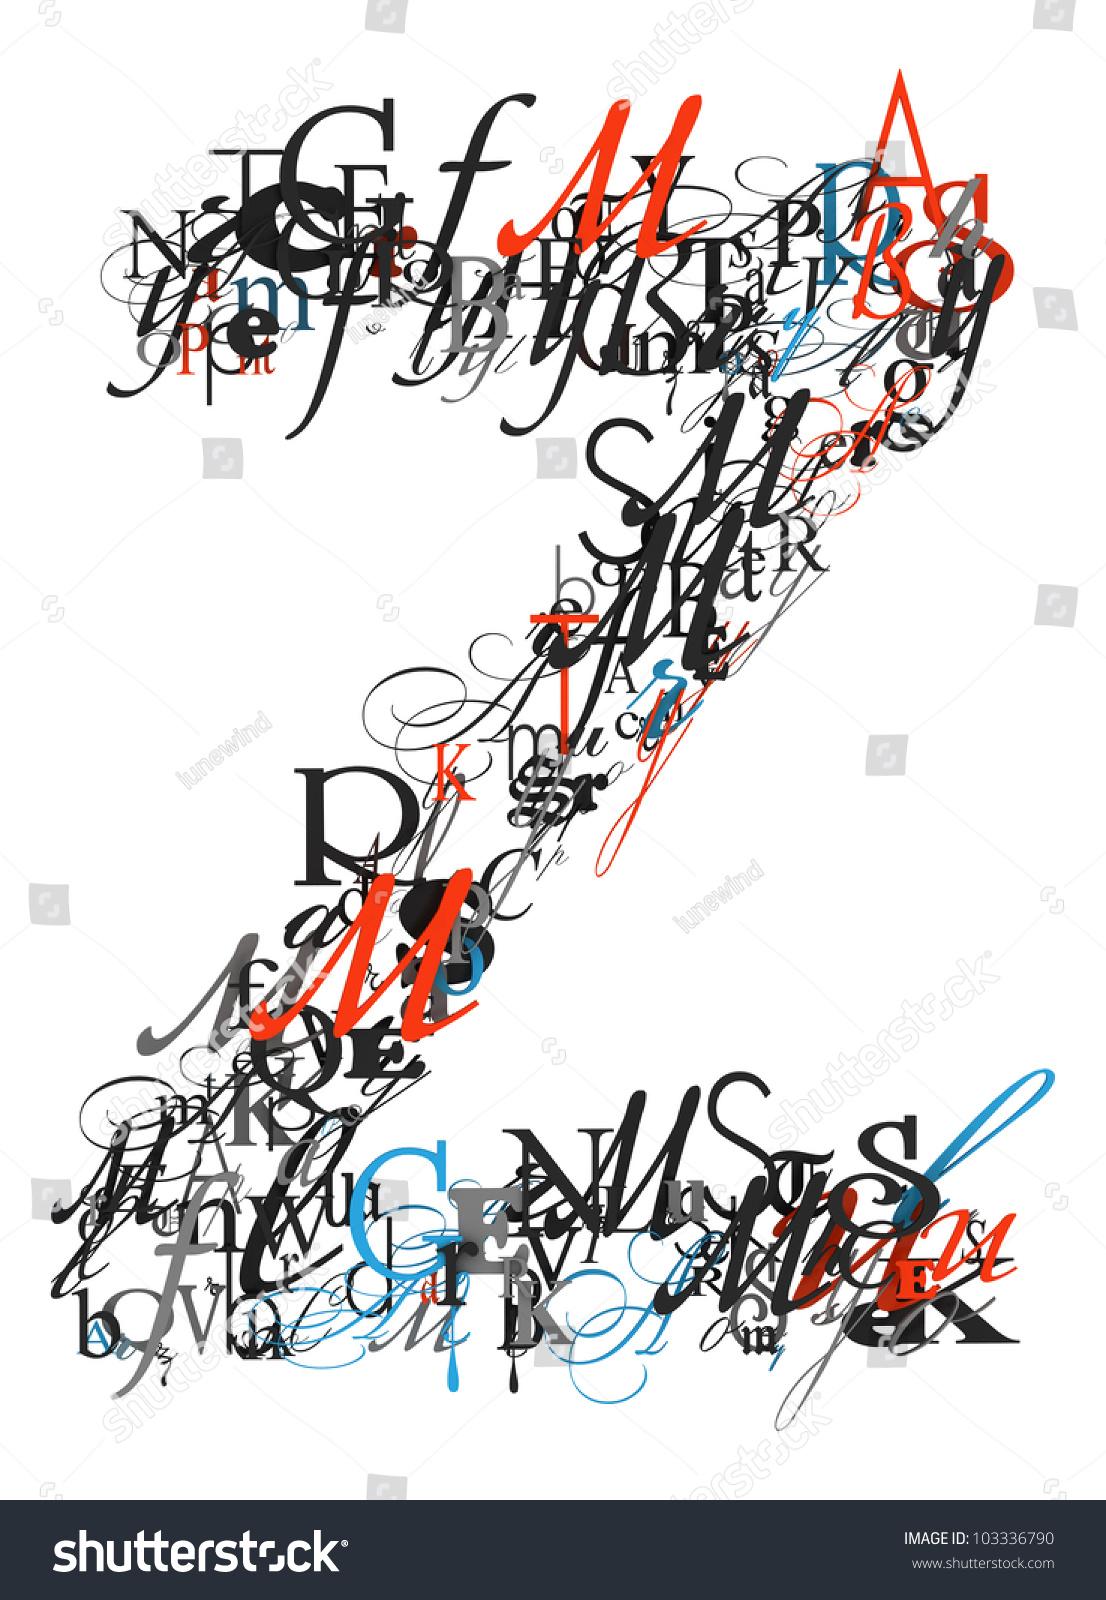 Royalty Free Stock Illustration Of Letter Z Alphabet Different Font